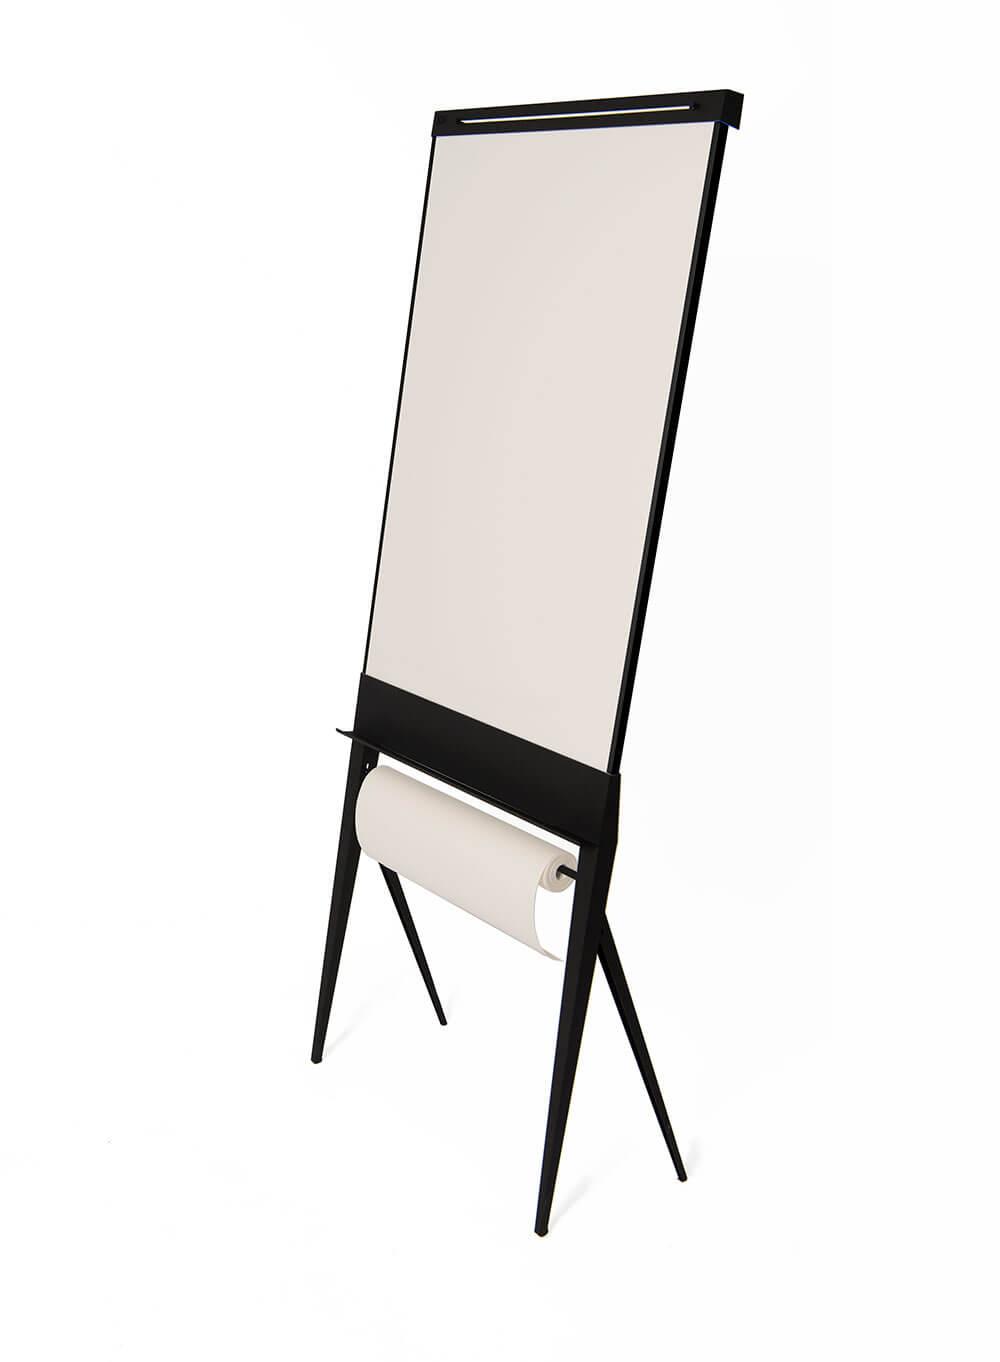 Design whiteboard flipover papierrolhouder interieurarchitectuur kantoormeubel